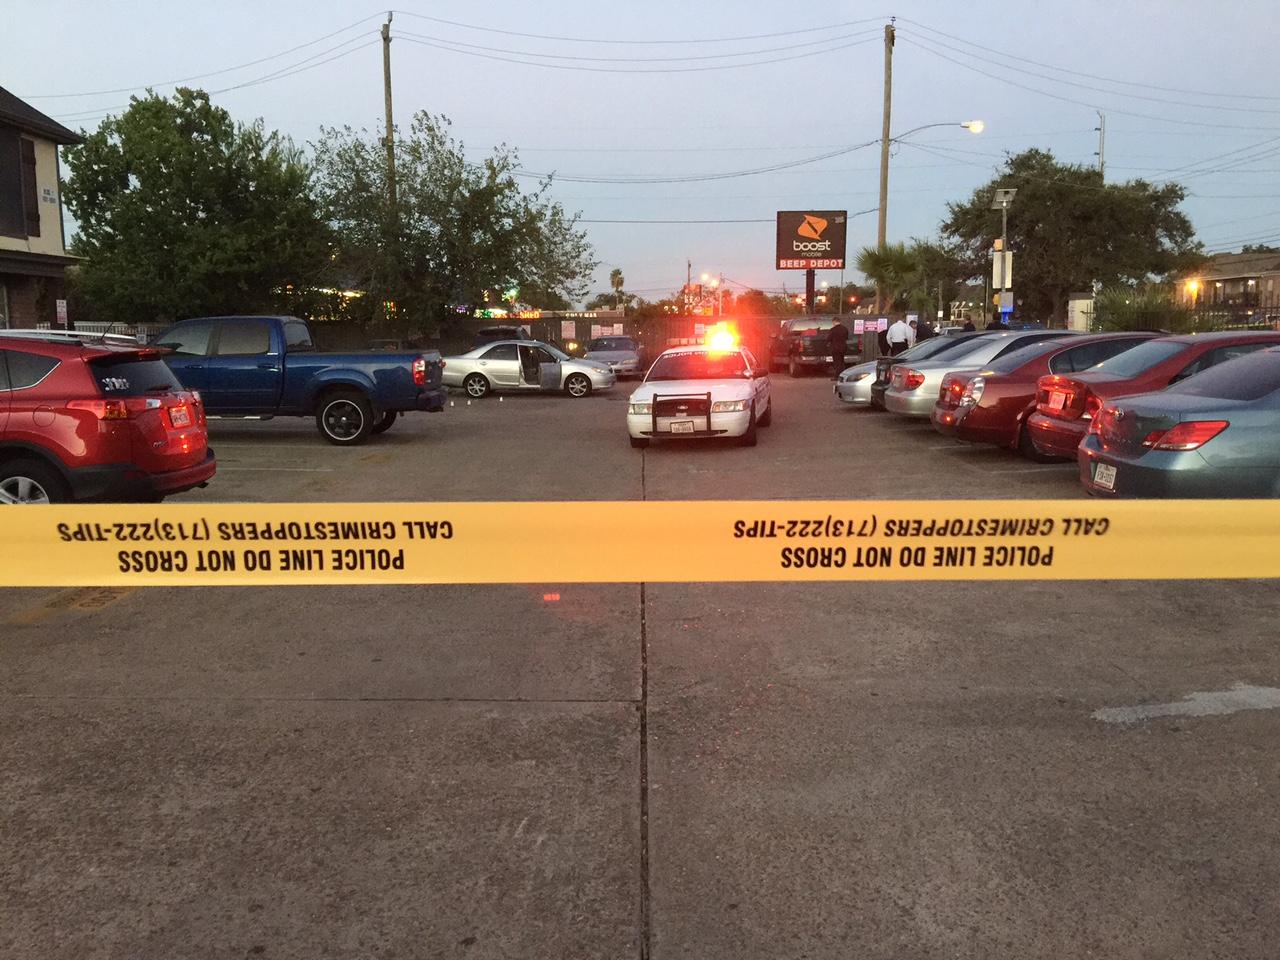 The Unarmed   HoustonChronicle com - Houston Chronicle